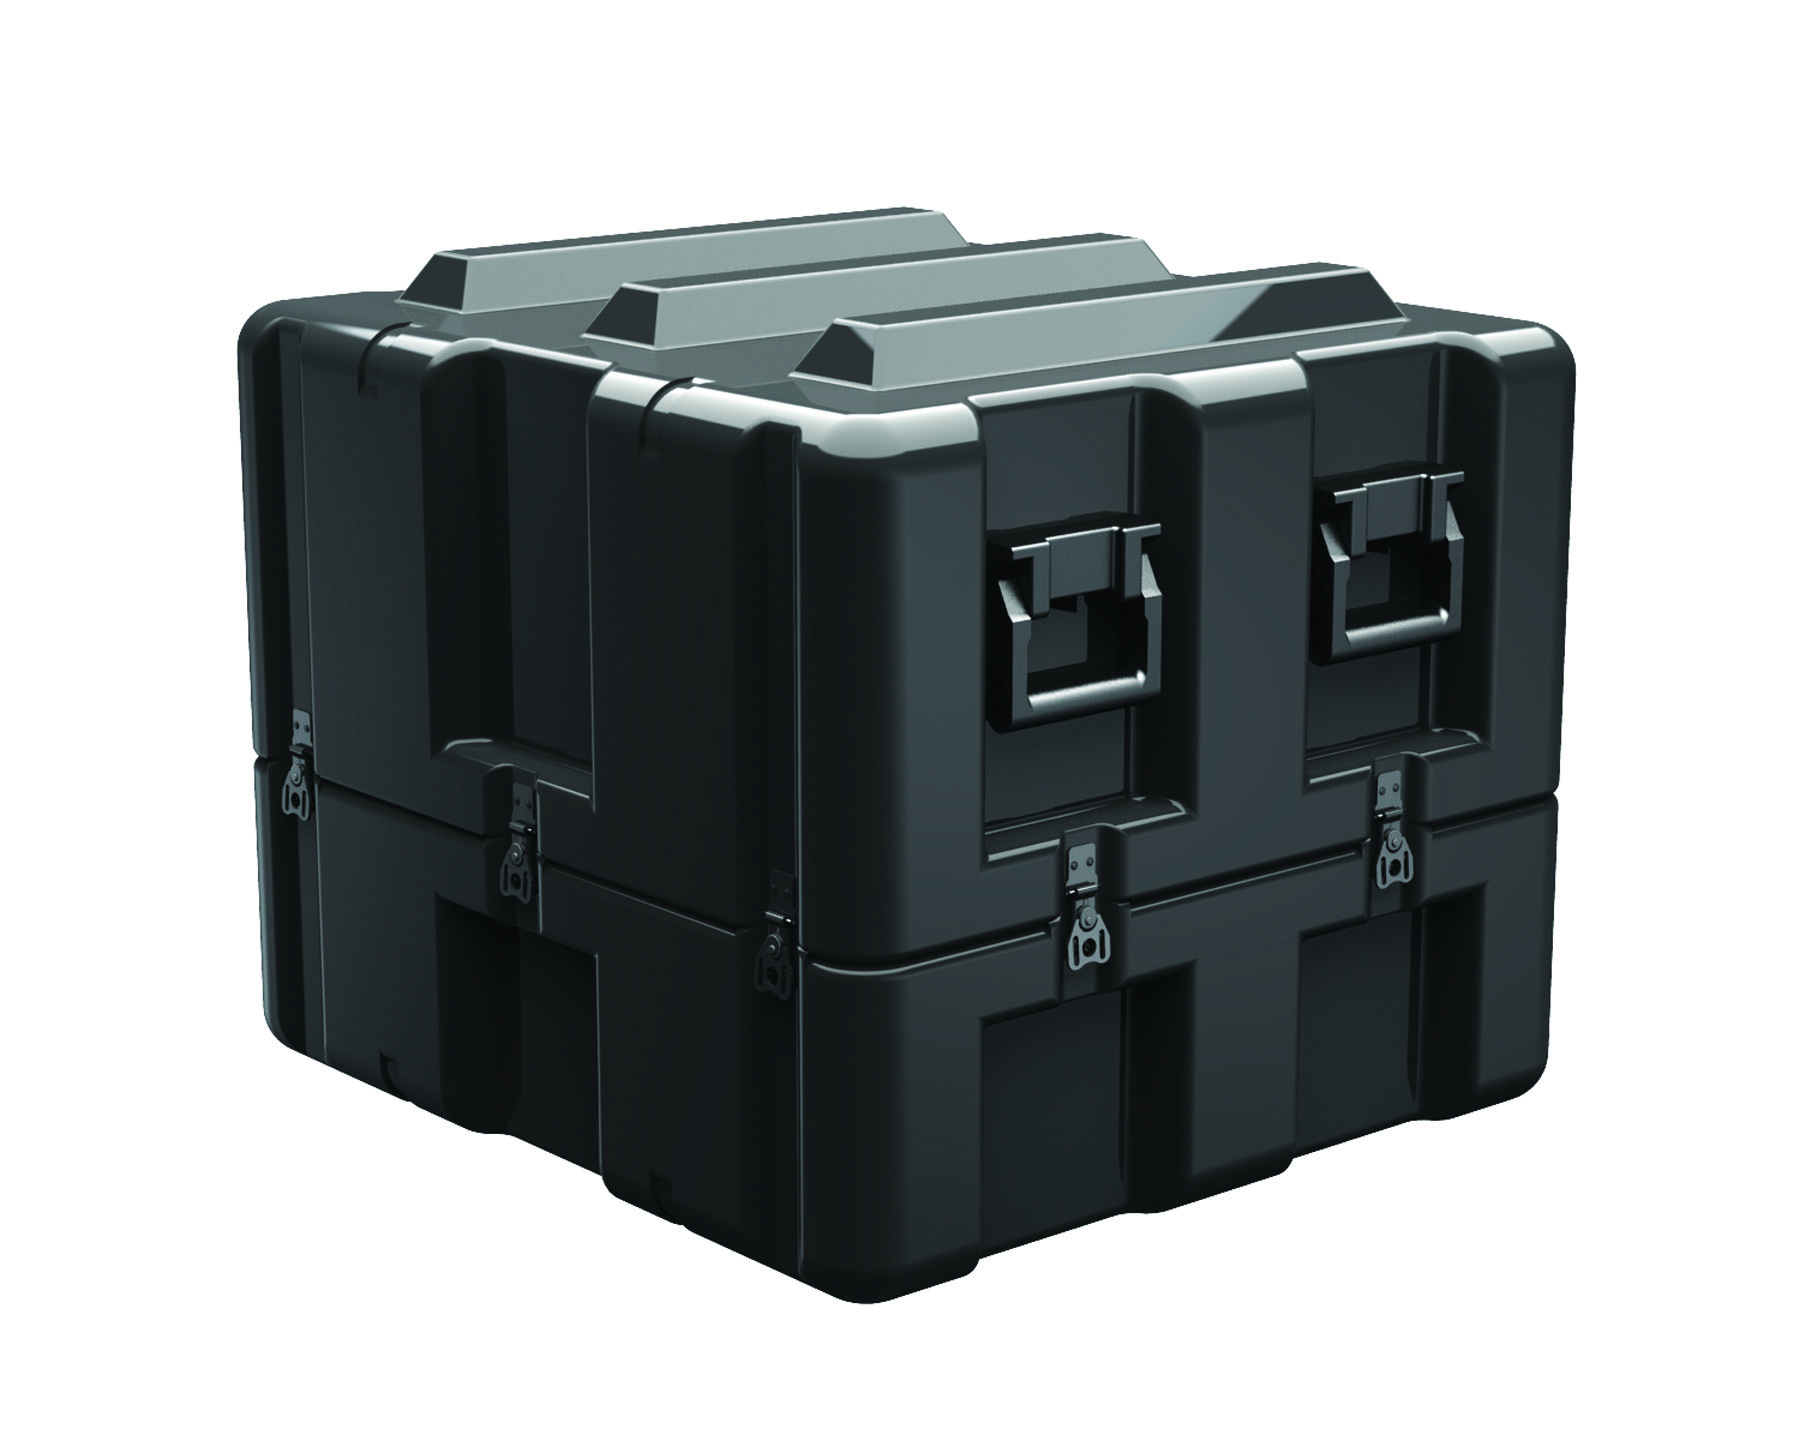 AL2624-0813 - Pelican Hard Cases AL2624-0813 Single Lid Case